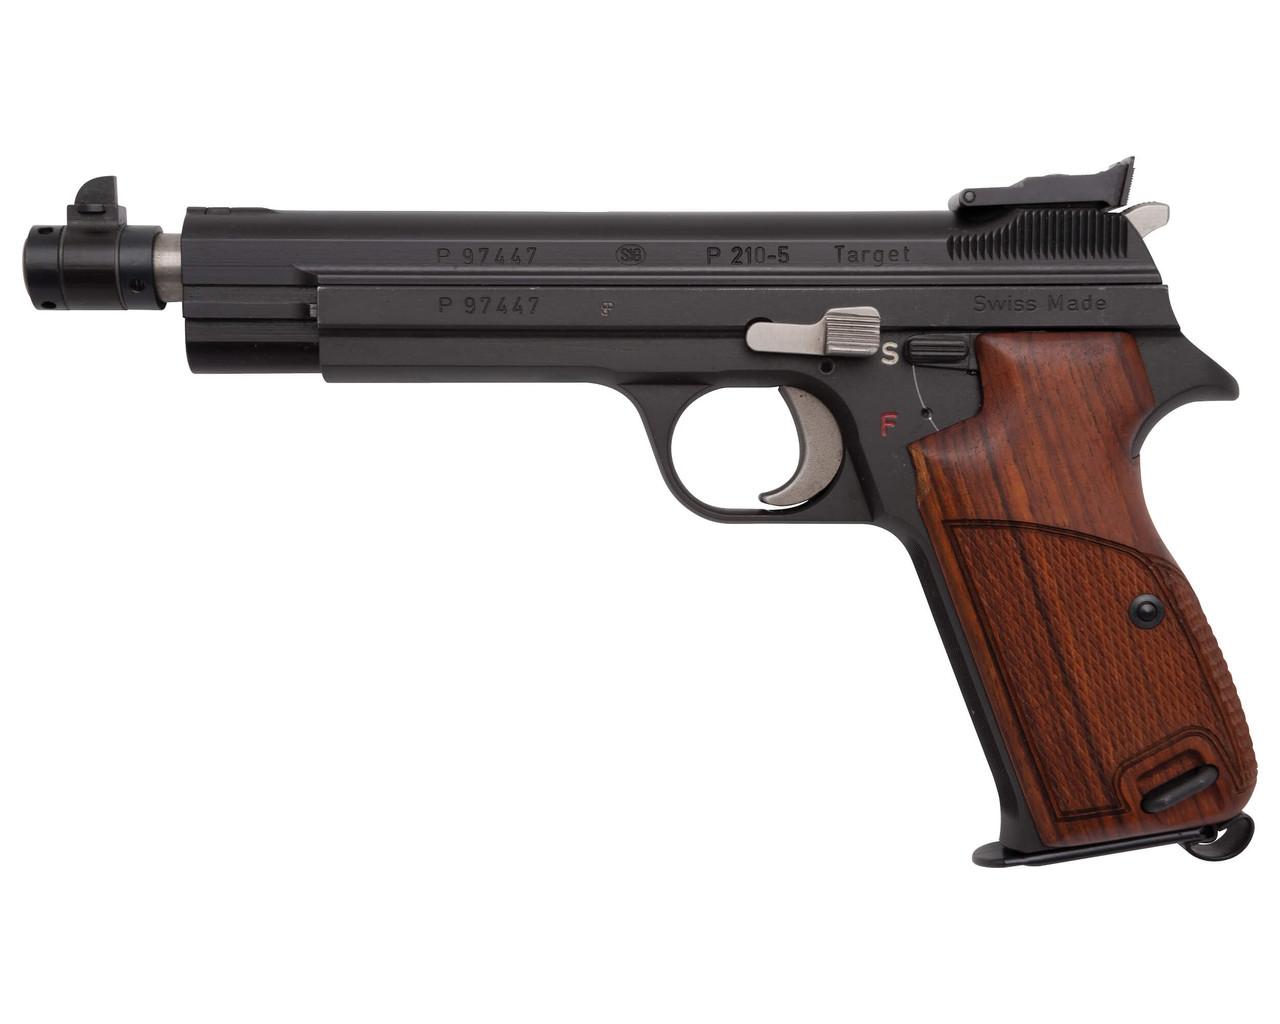 "Scarce SIG P210-5 Target - 5.9"" Barrel - sn P97xxx"